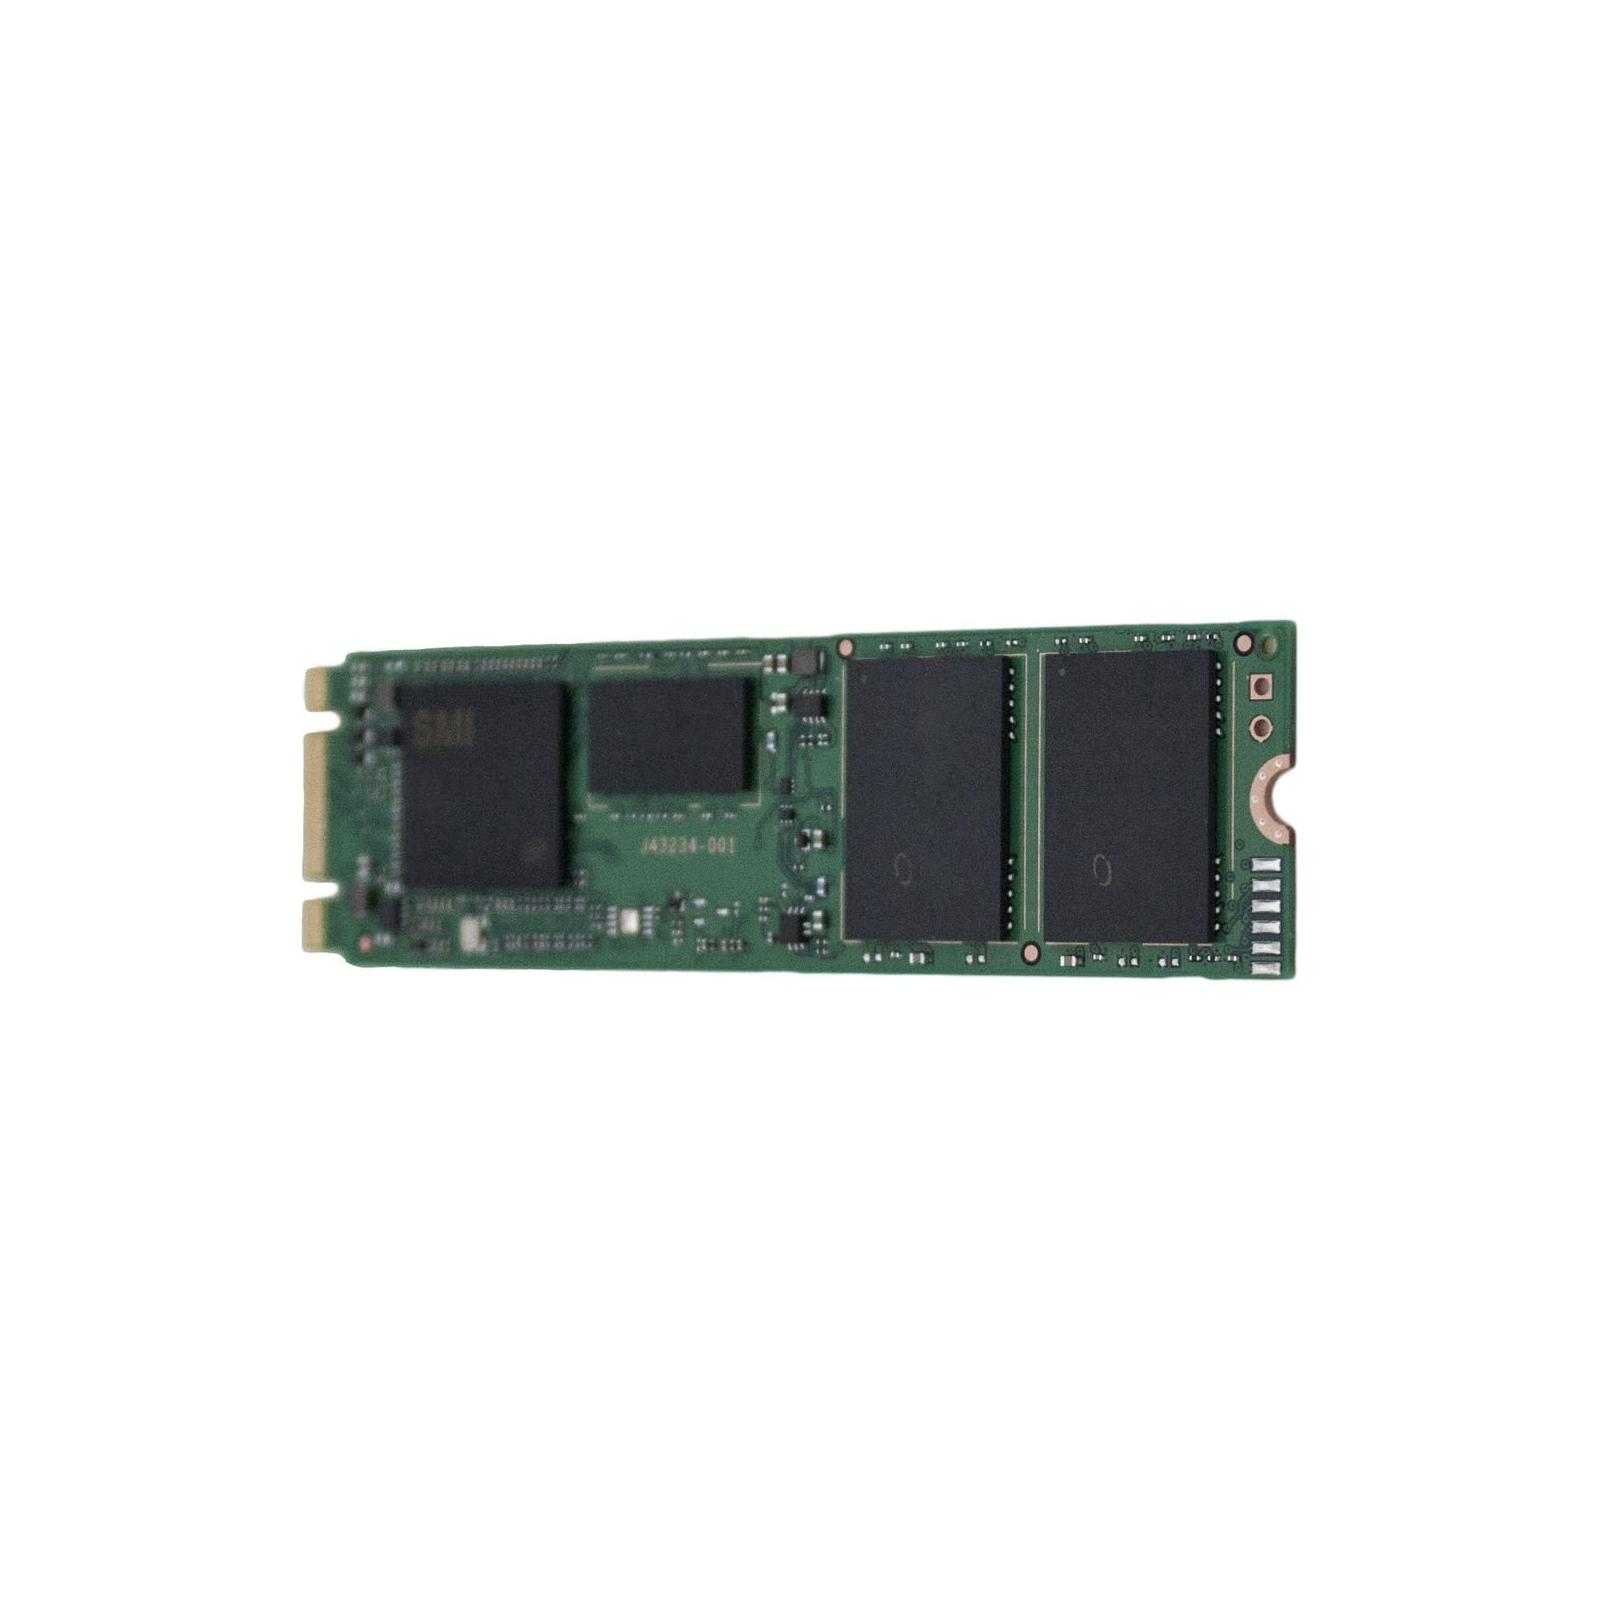 Накопитель SSD M.2 2280 128GB INTEL (SSDSCKKW128G8X1) изображение 4